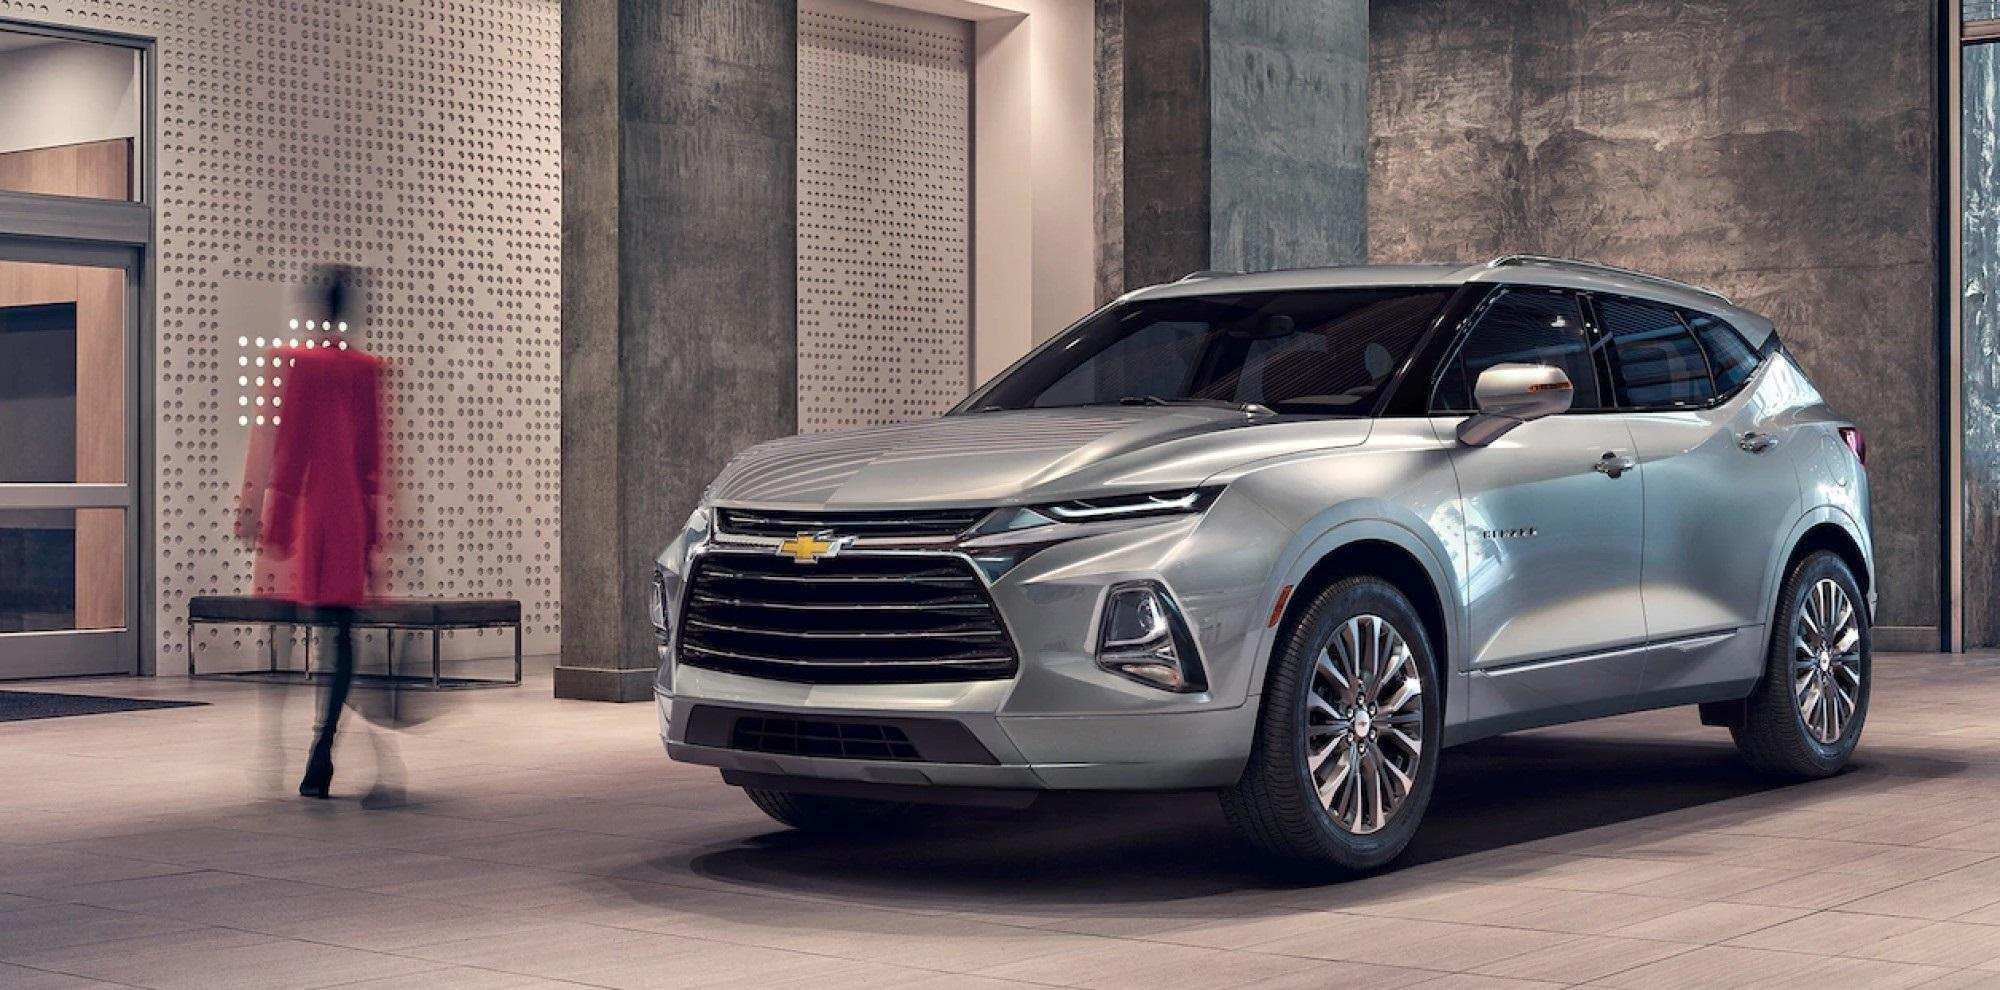 18 Best Review New New Chevrolet 2019 Blazer Engine Specs by New New Chevrolet 2019 Blazer Engine